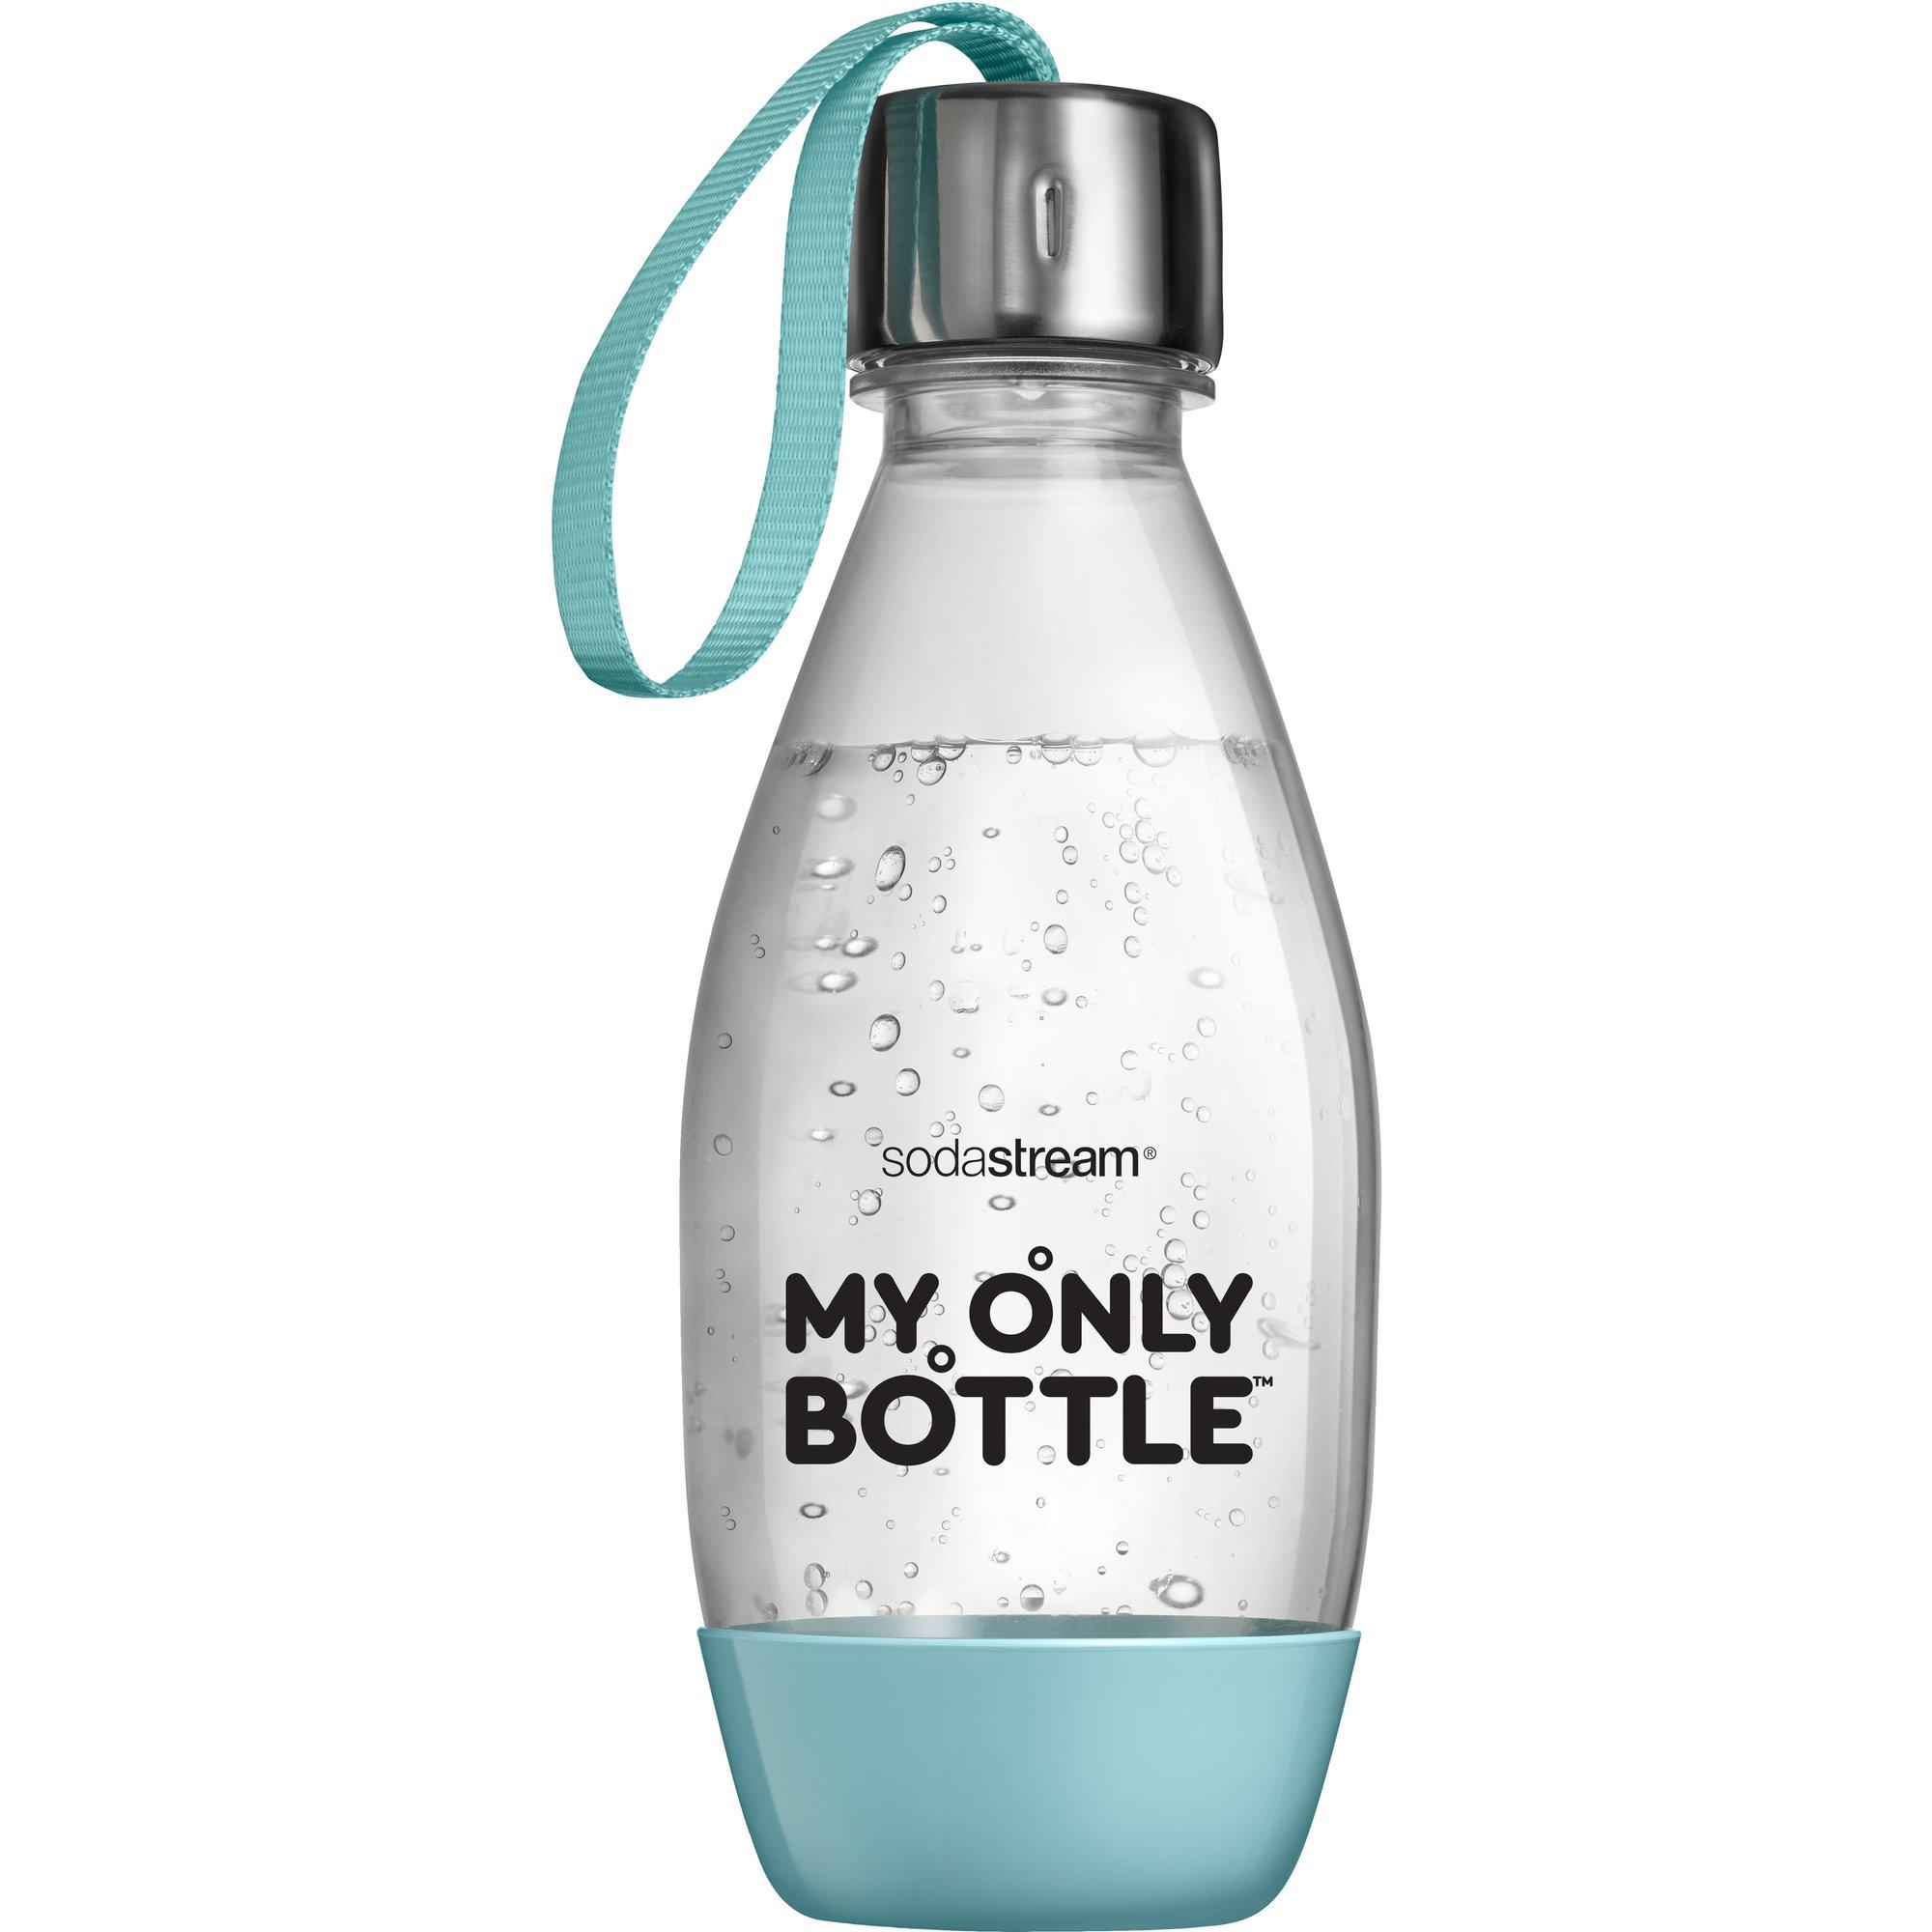 SodaStream My Only Bottle dricksflaska Icy Blue